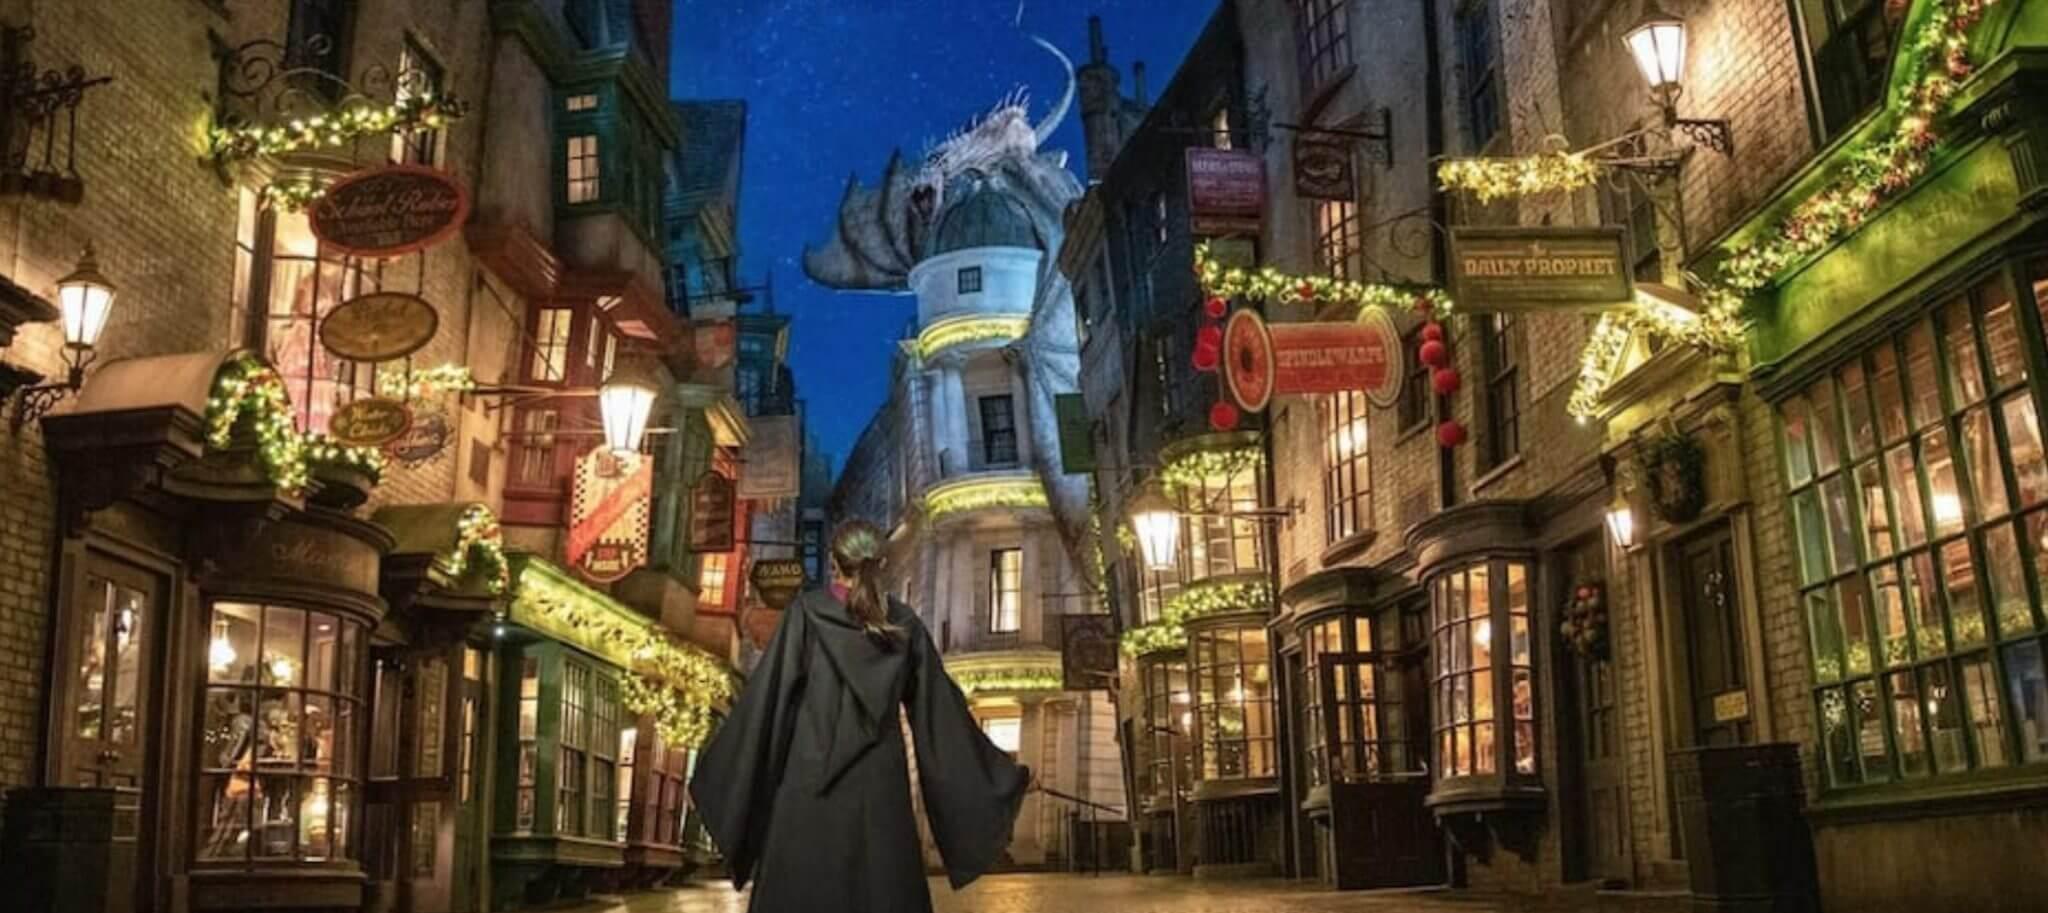 Universal Orlando Holiday Wizarding World